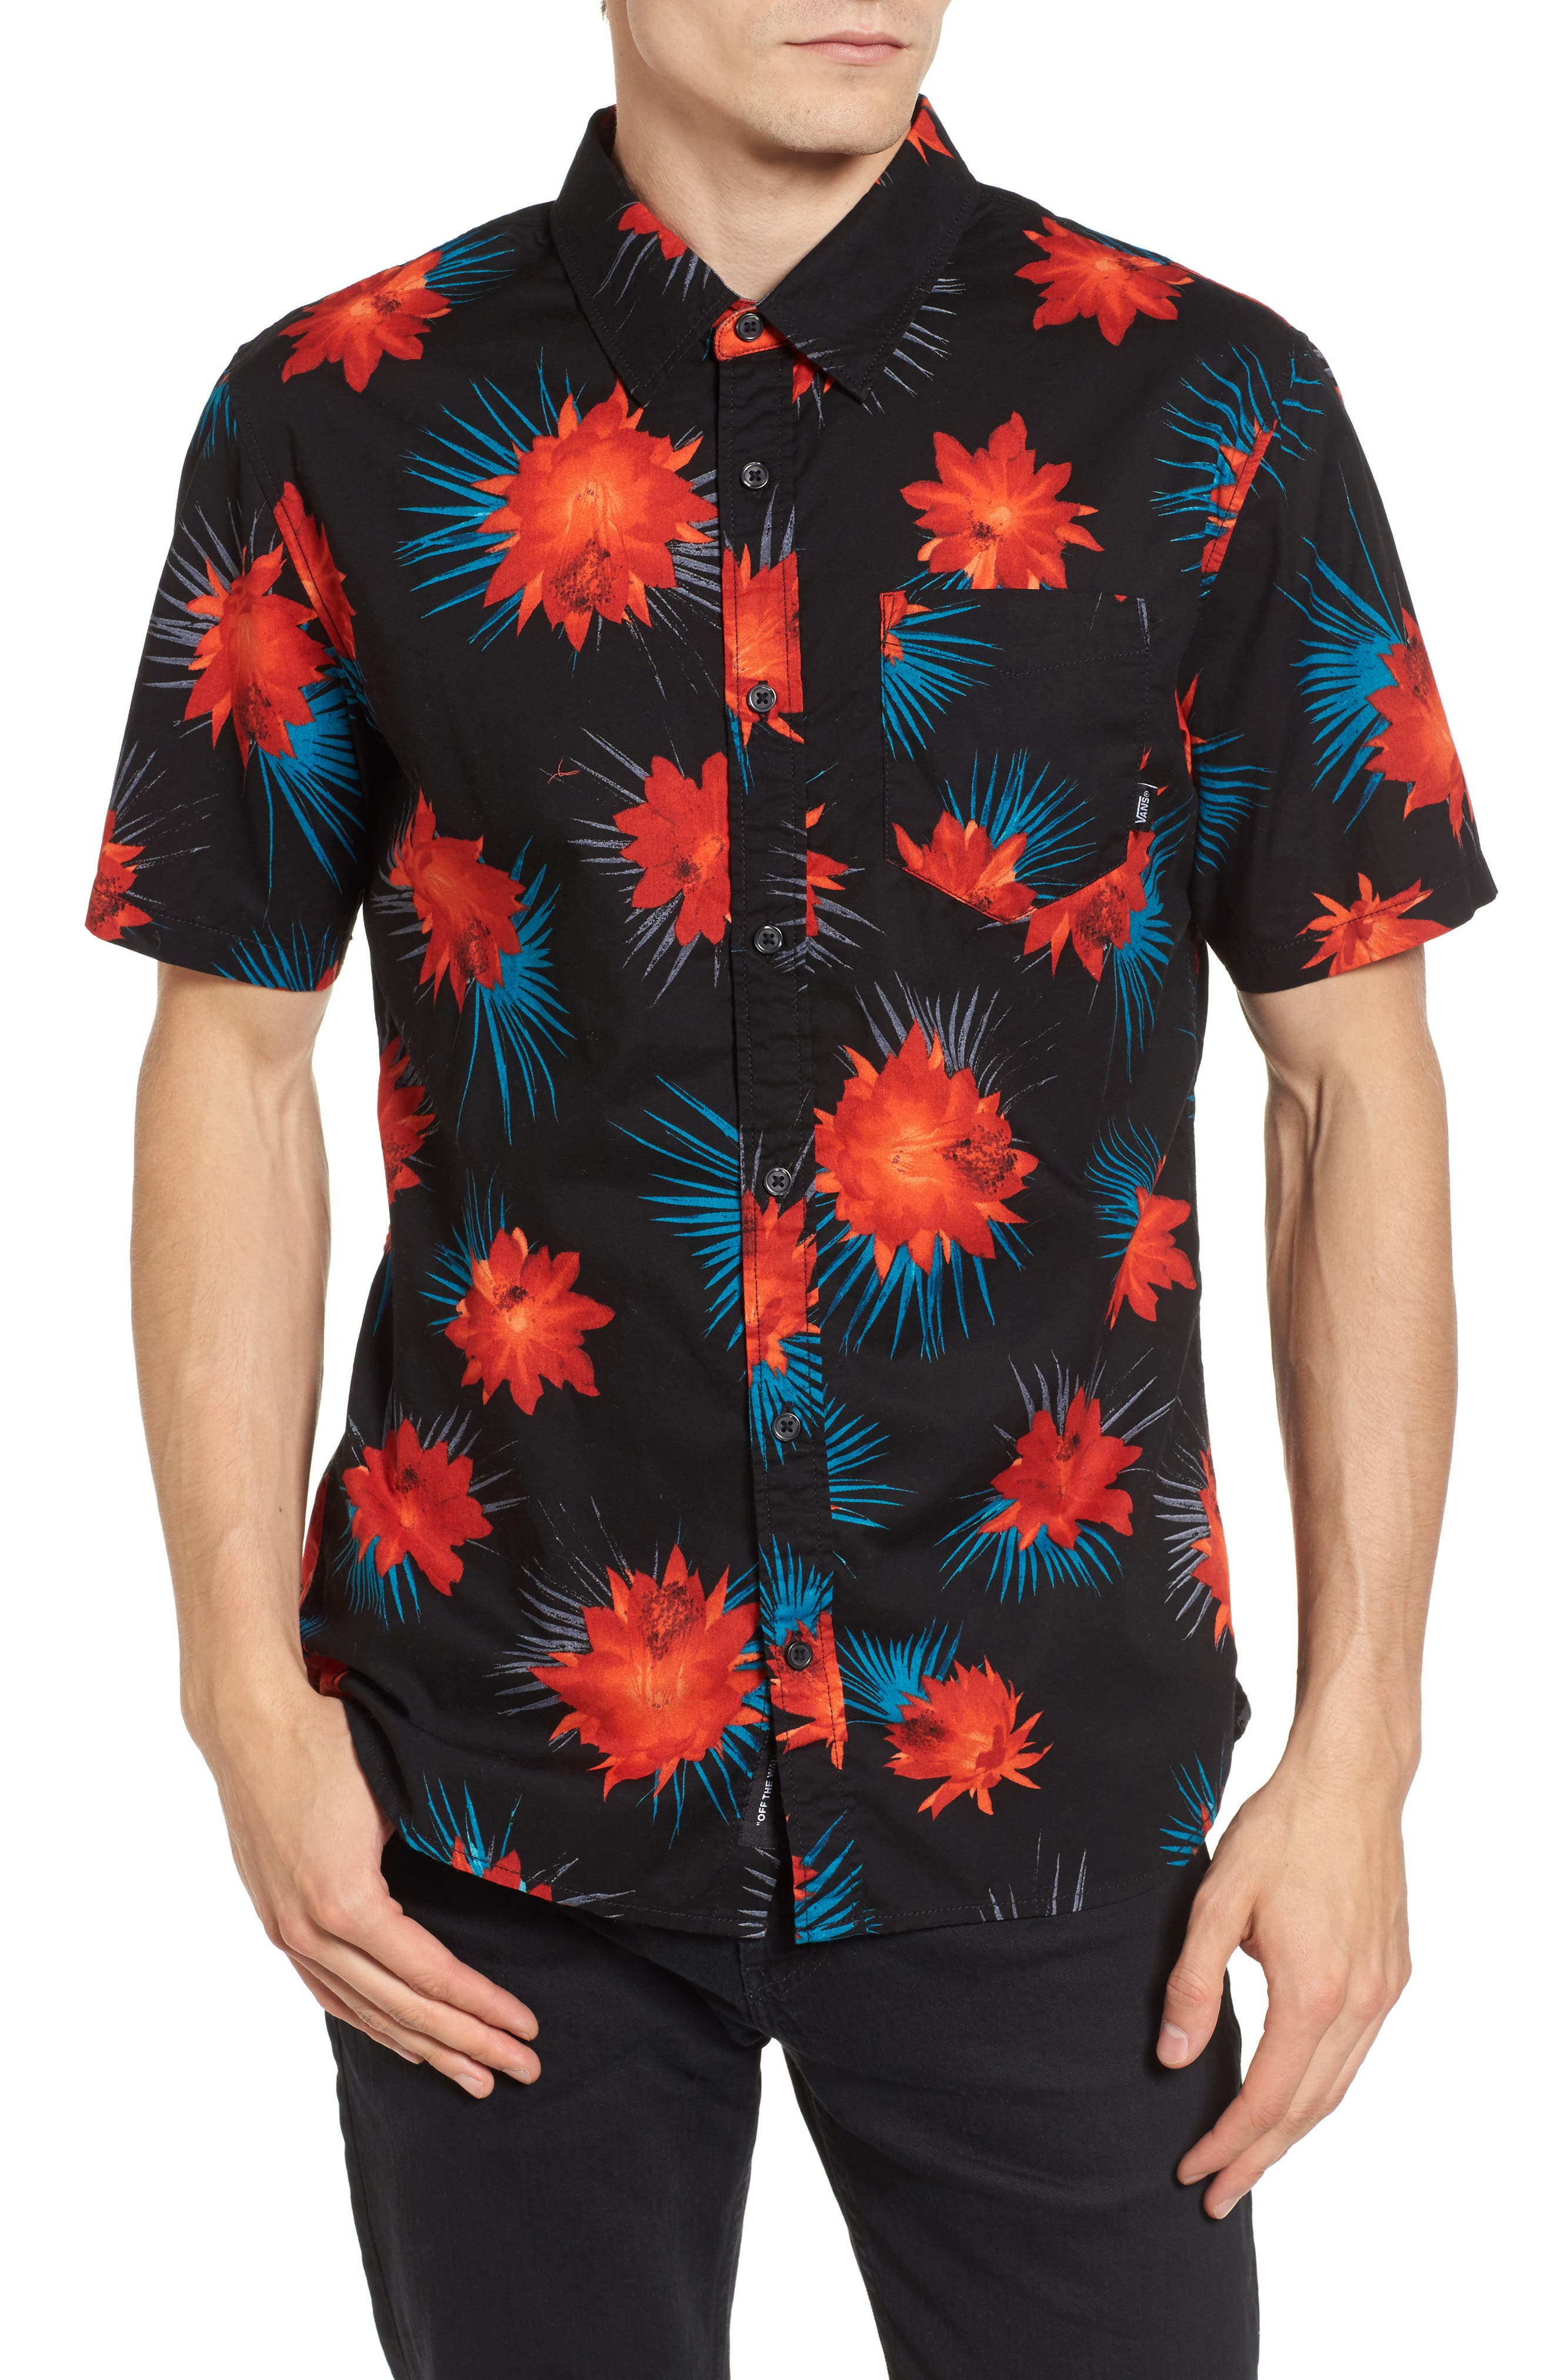 Cultivar Woven Shirt,                             Main thumbnail 1, color,